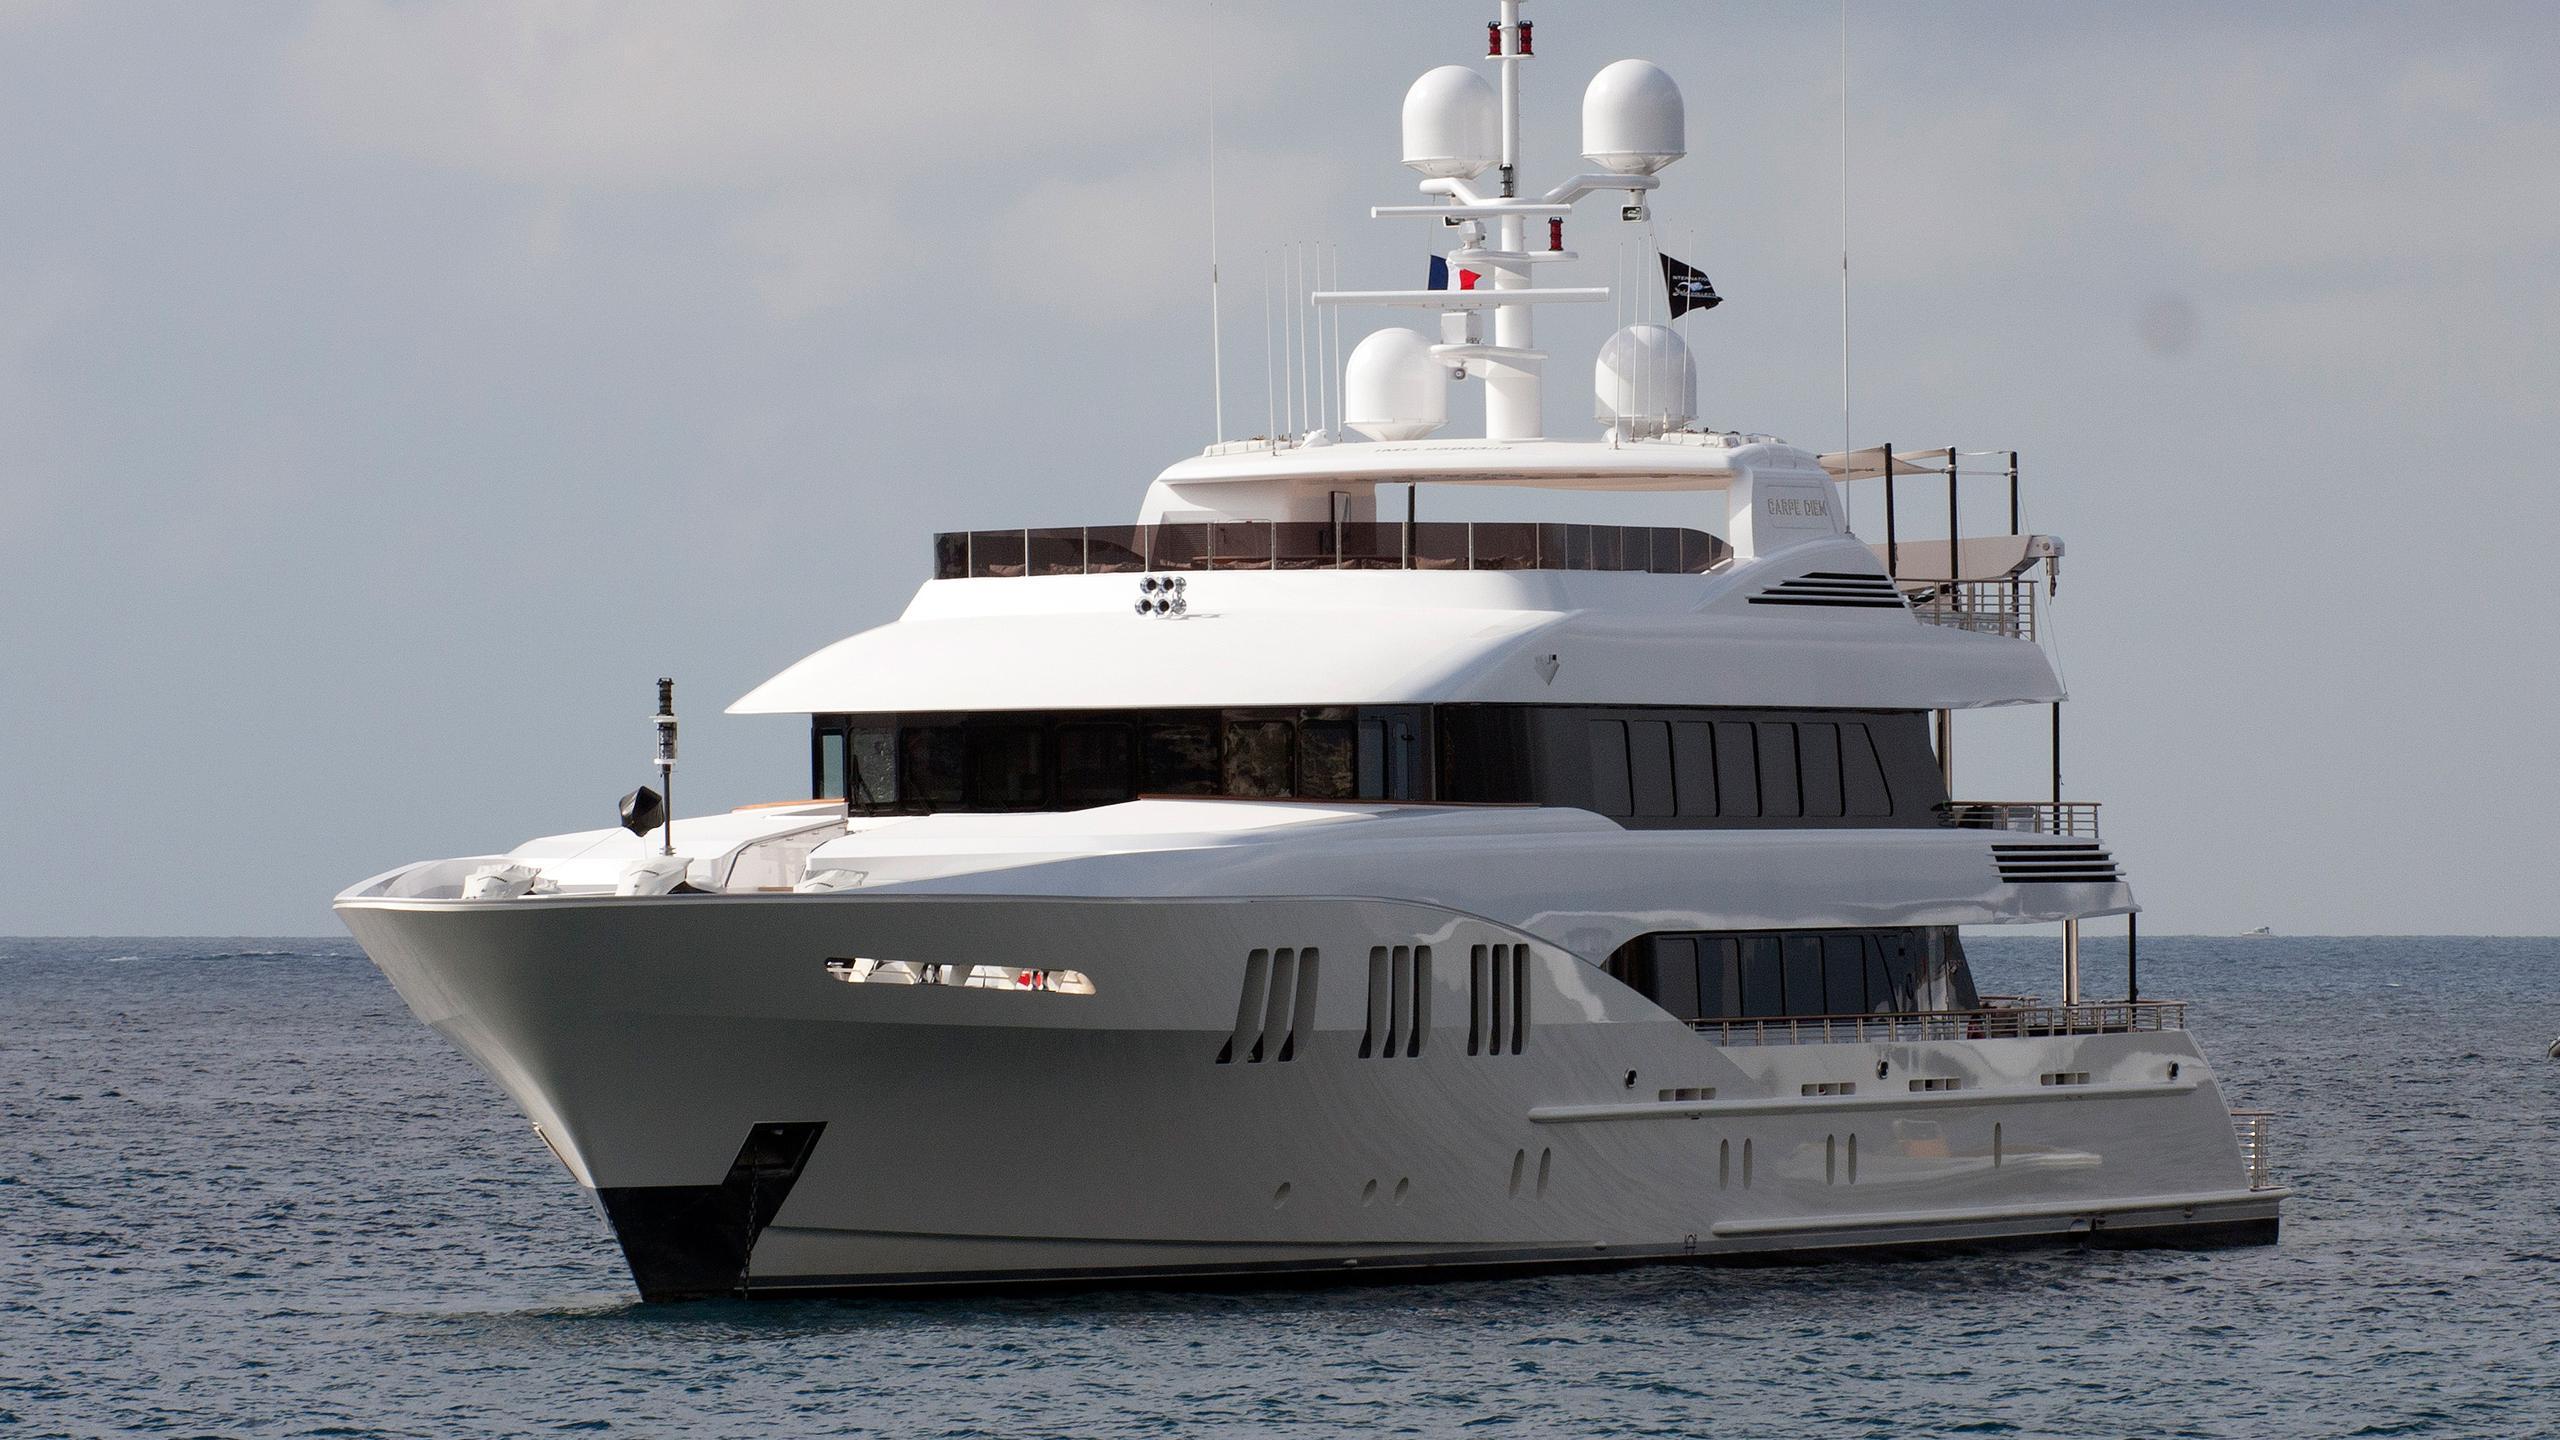 CARPE-DIEM-motor-yacht-trinity-2011-58m-half-profile